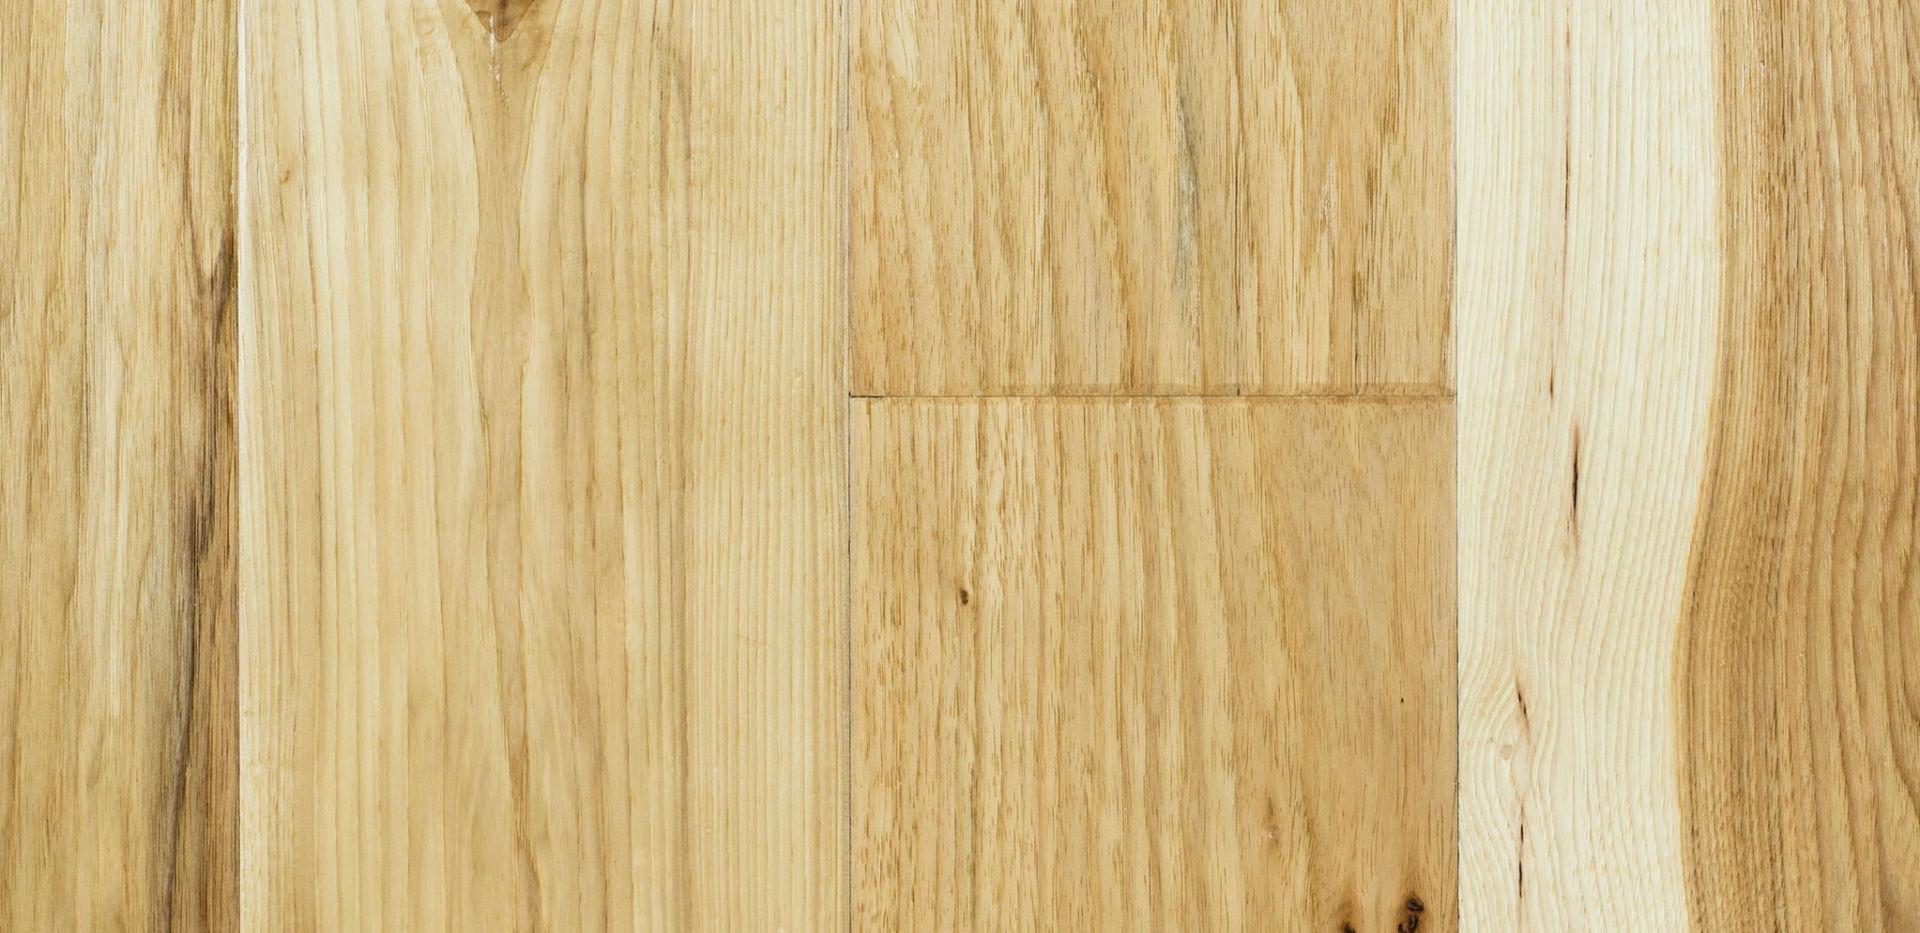 Hickory Natural Handscraped